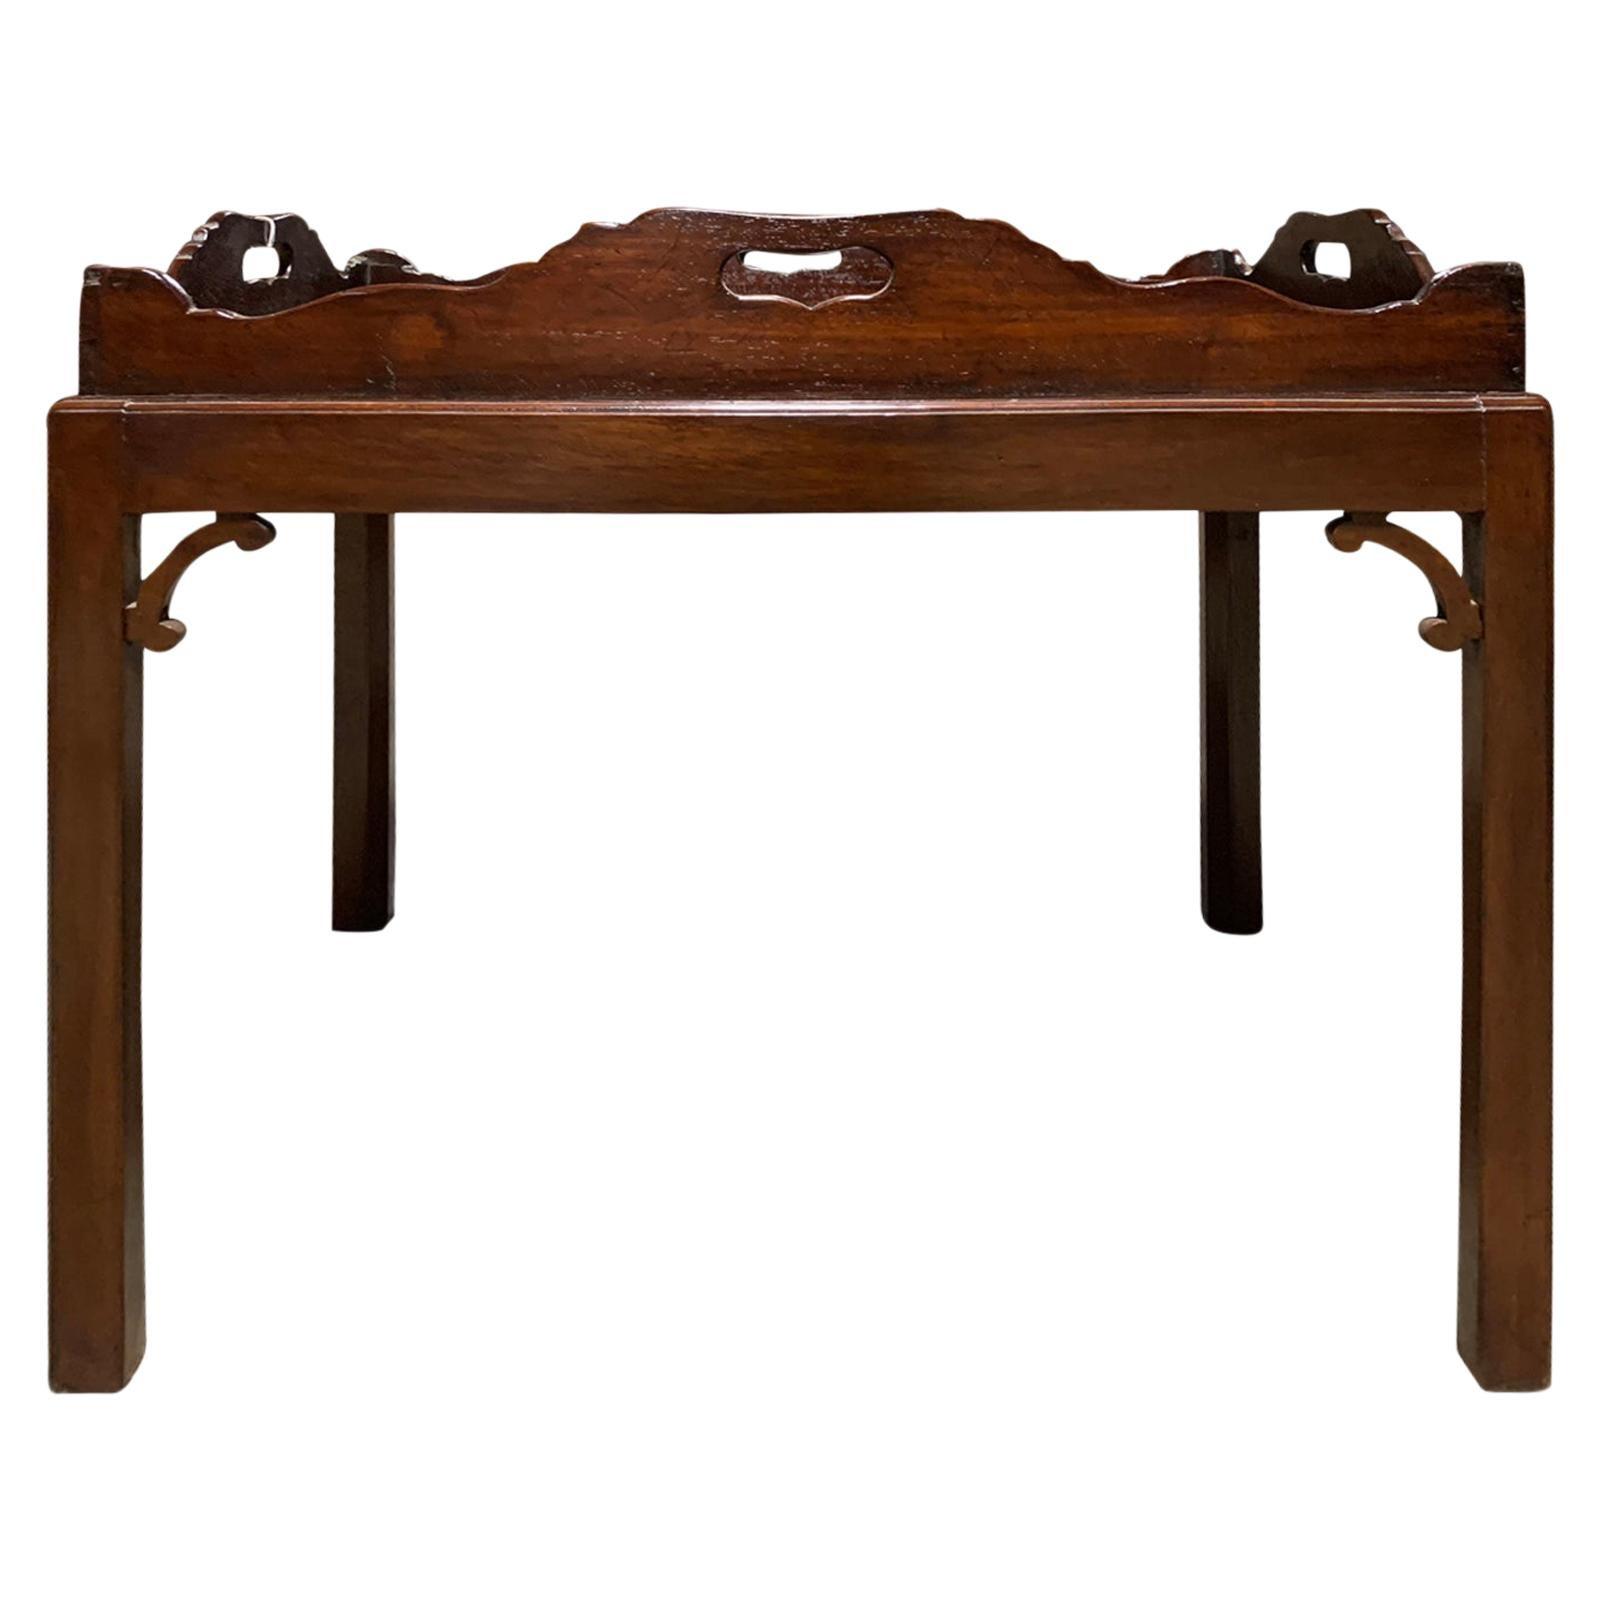 19th Century English Wood Tray Table